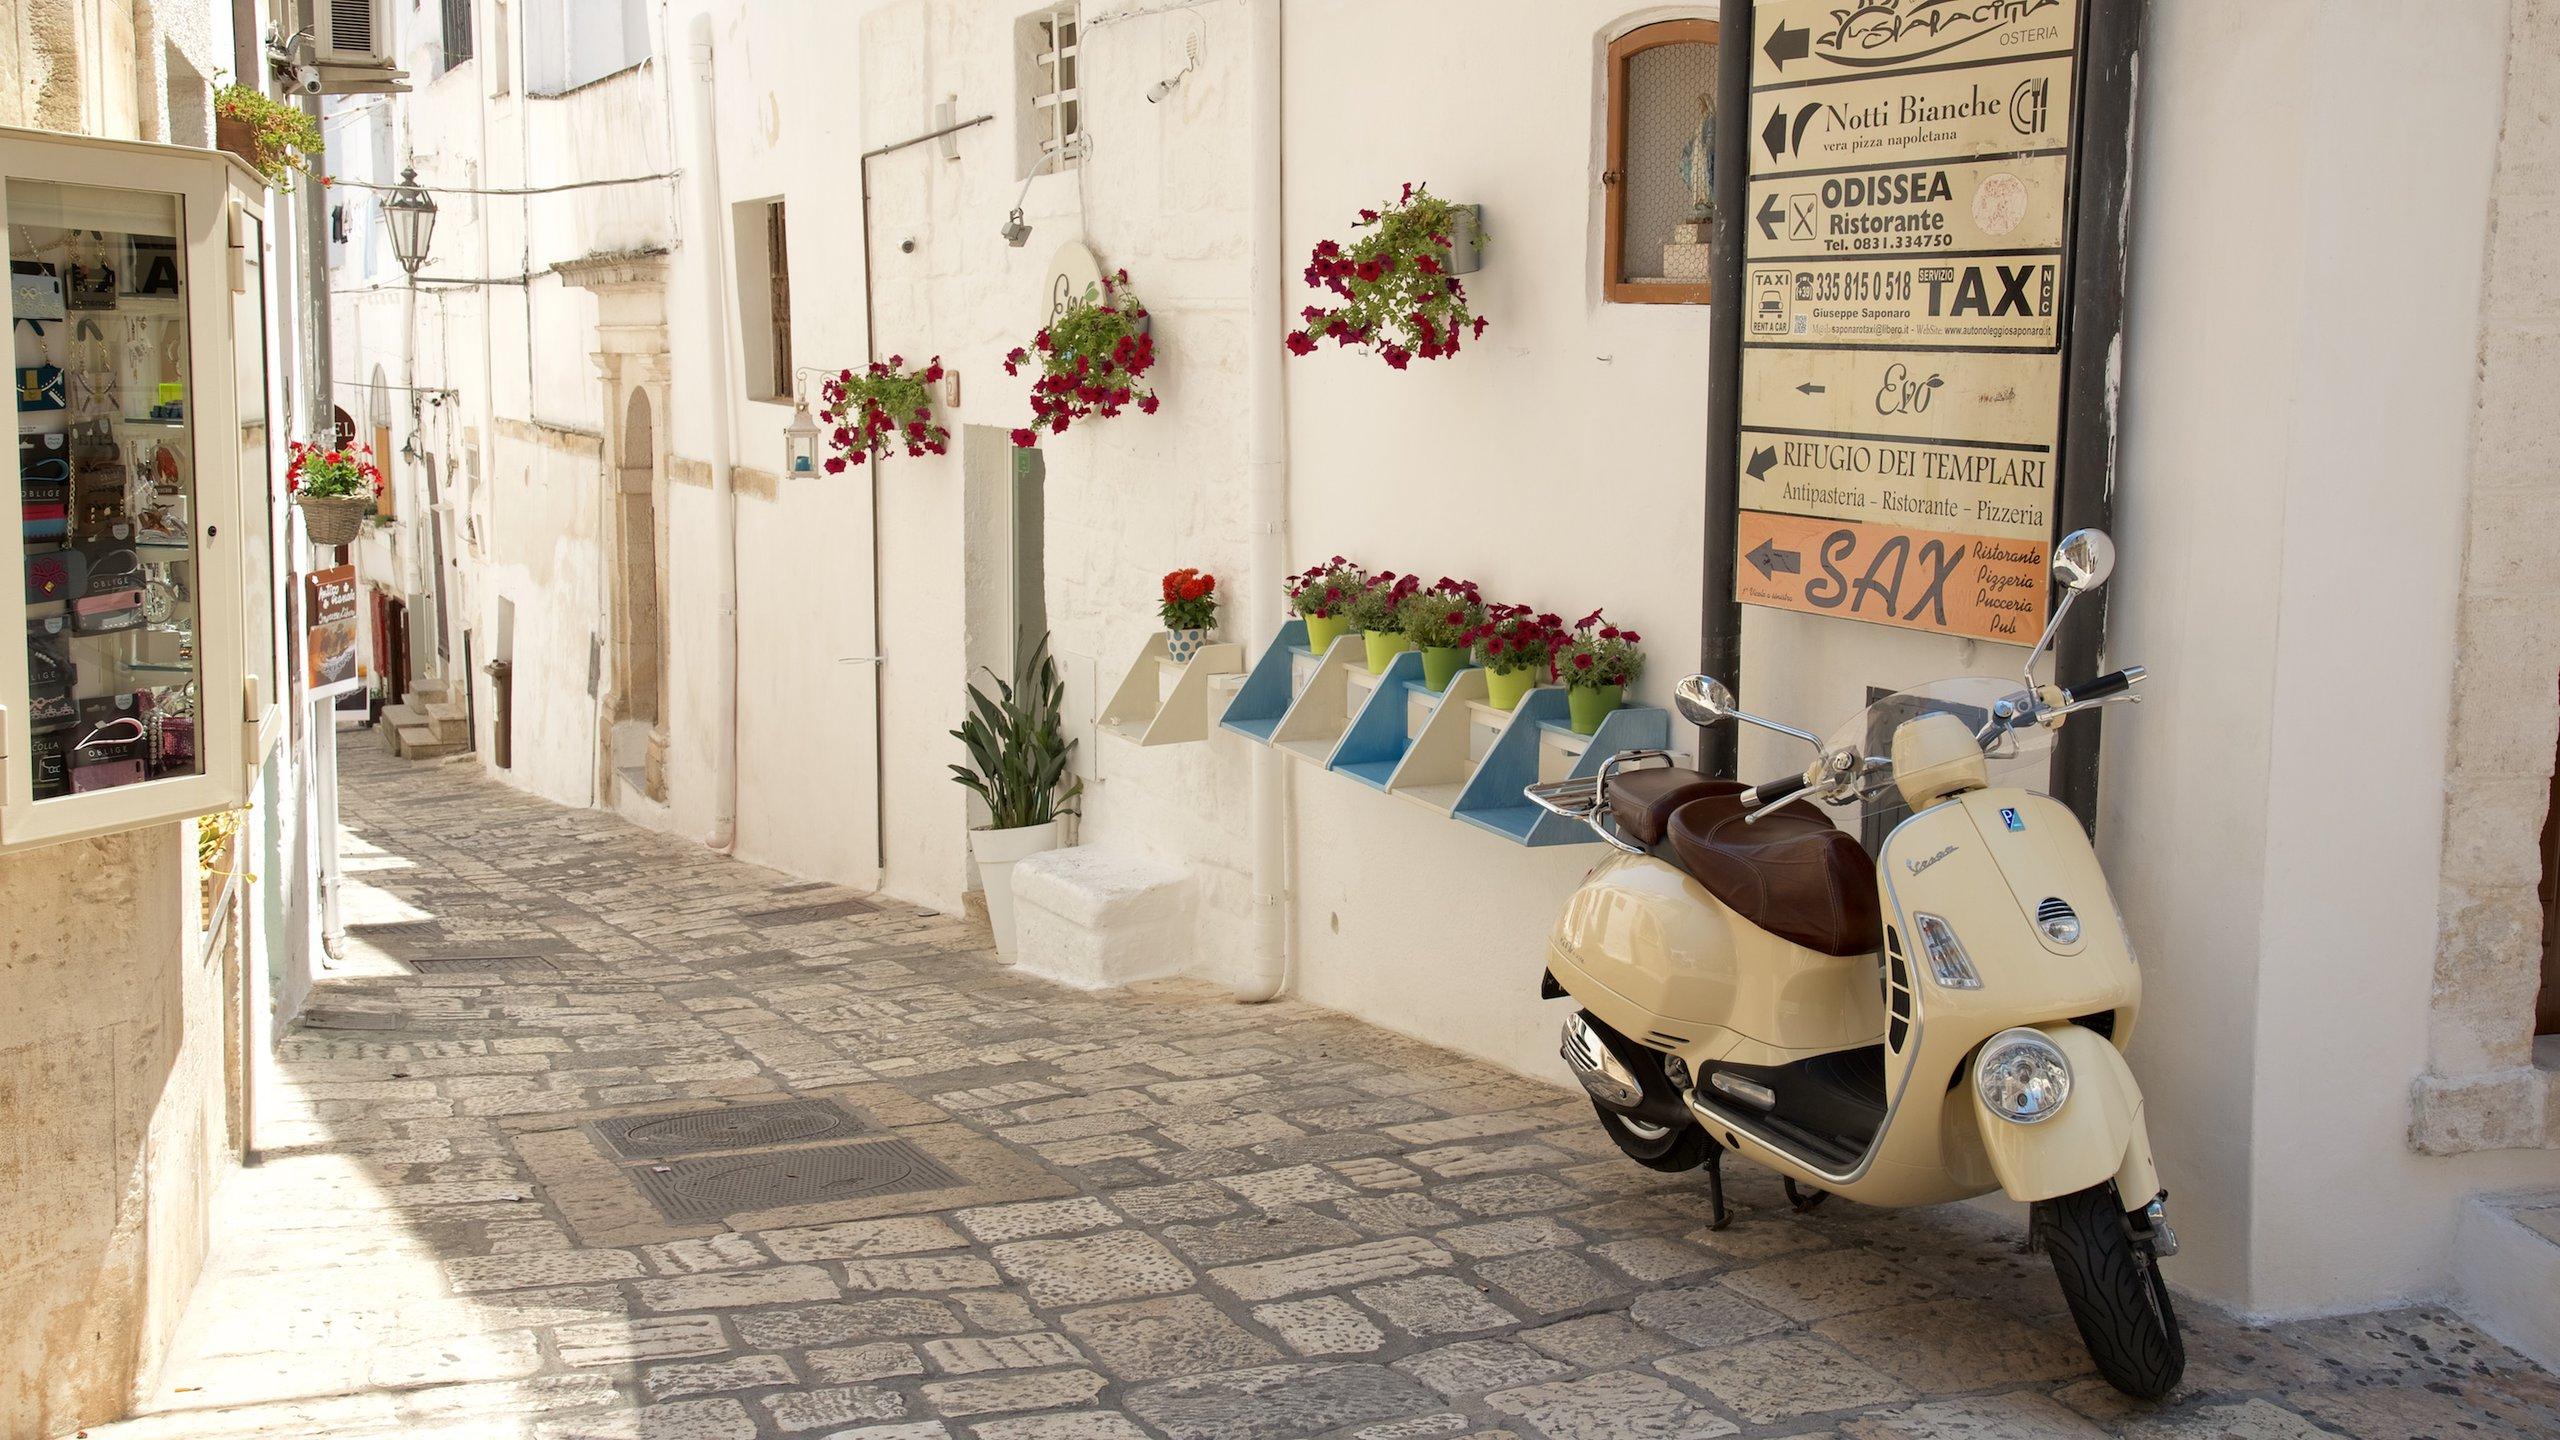 Ristorante Martina Rosa Ischia brindisi hotels from $61 - cheap hotel deals | travelocity